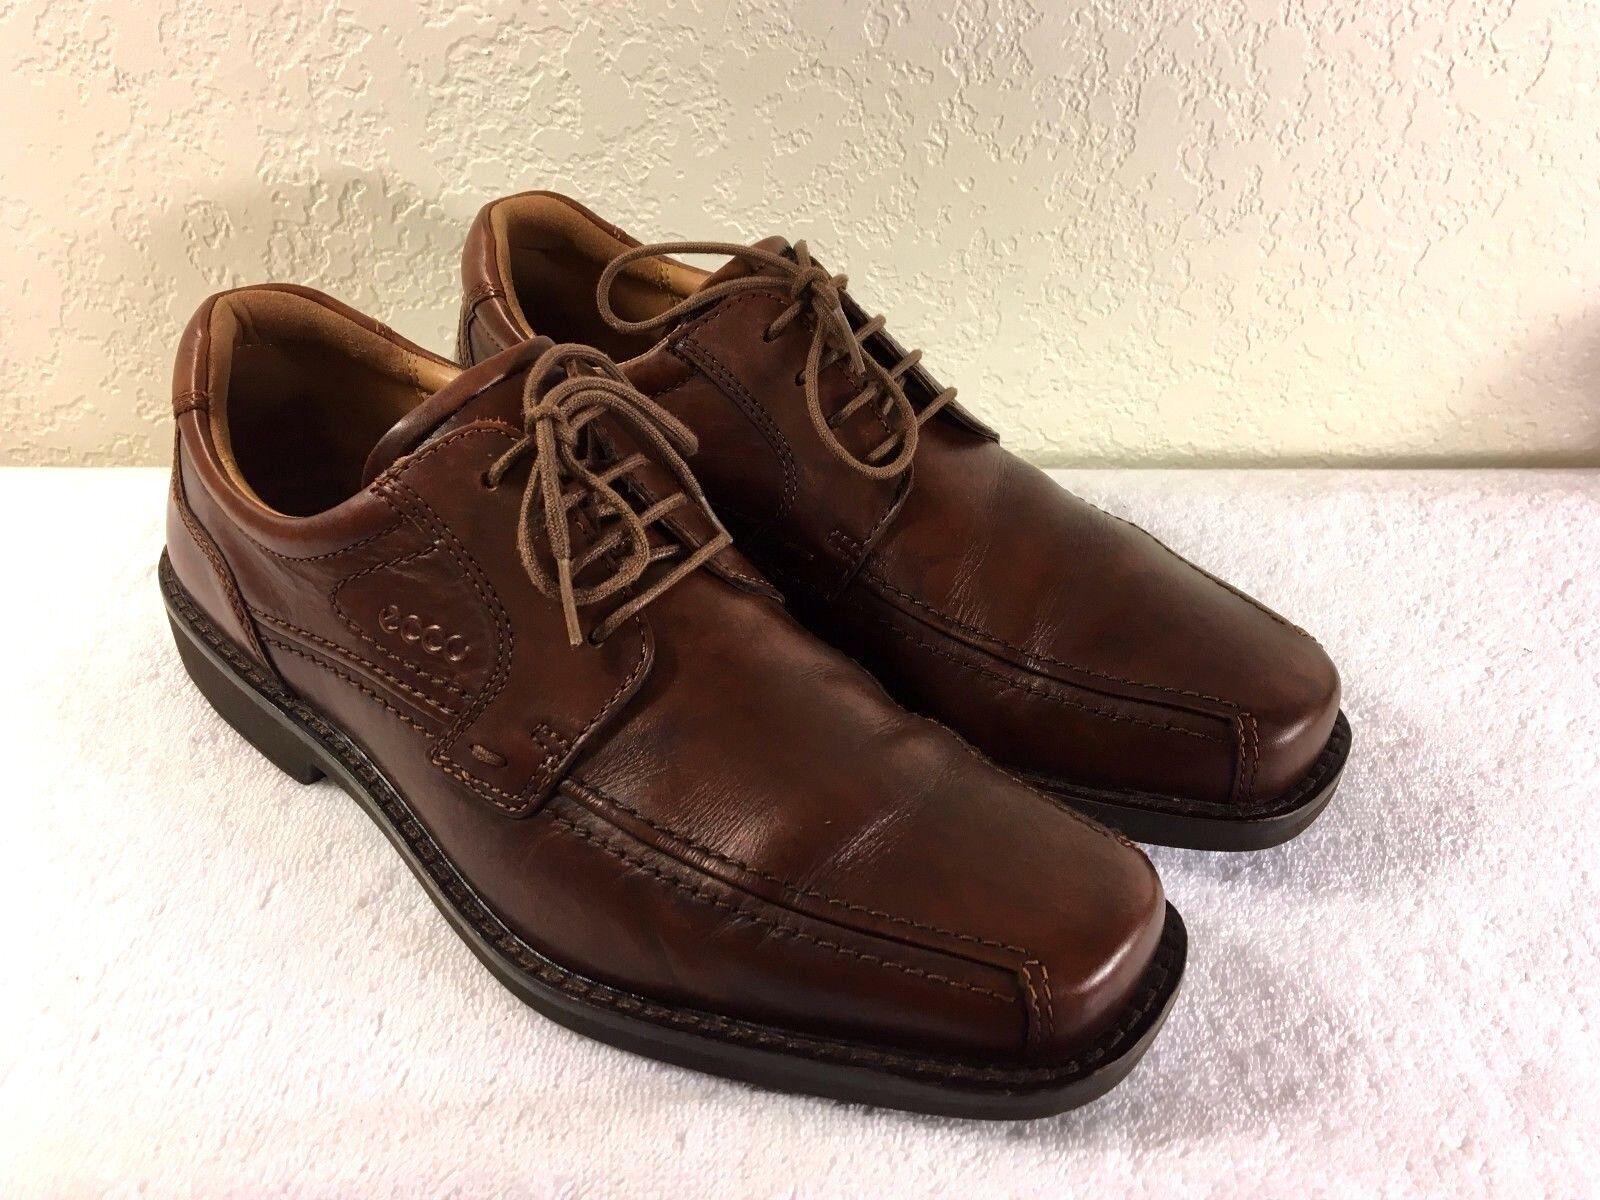 ECCO men's Brown Leather shoes Size 43 Good Shape